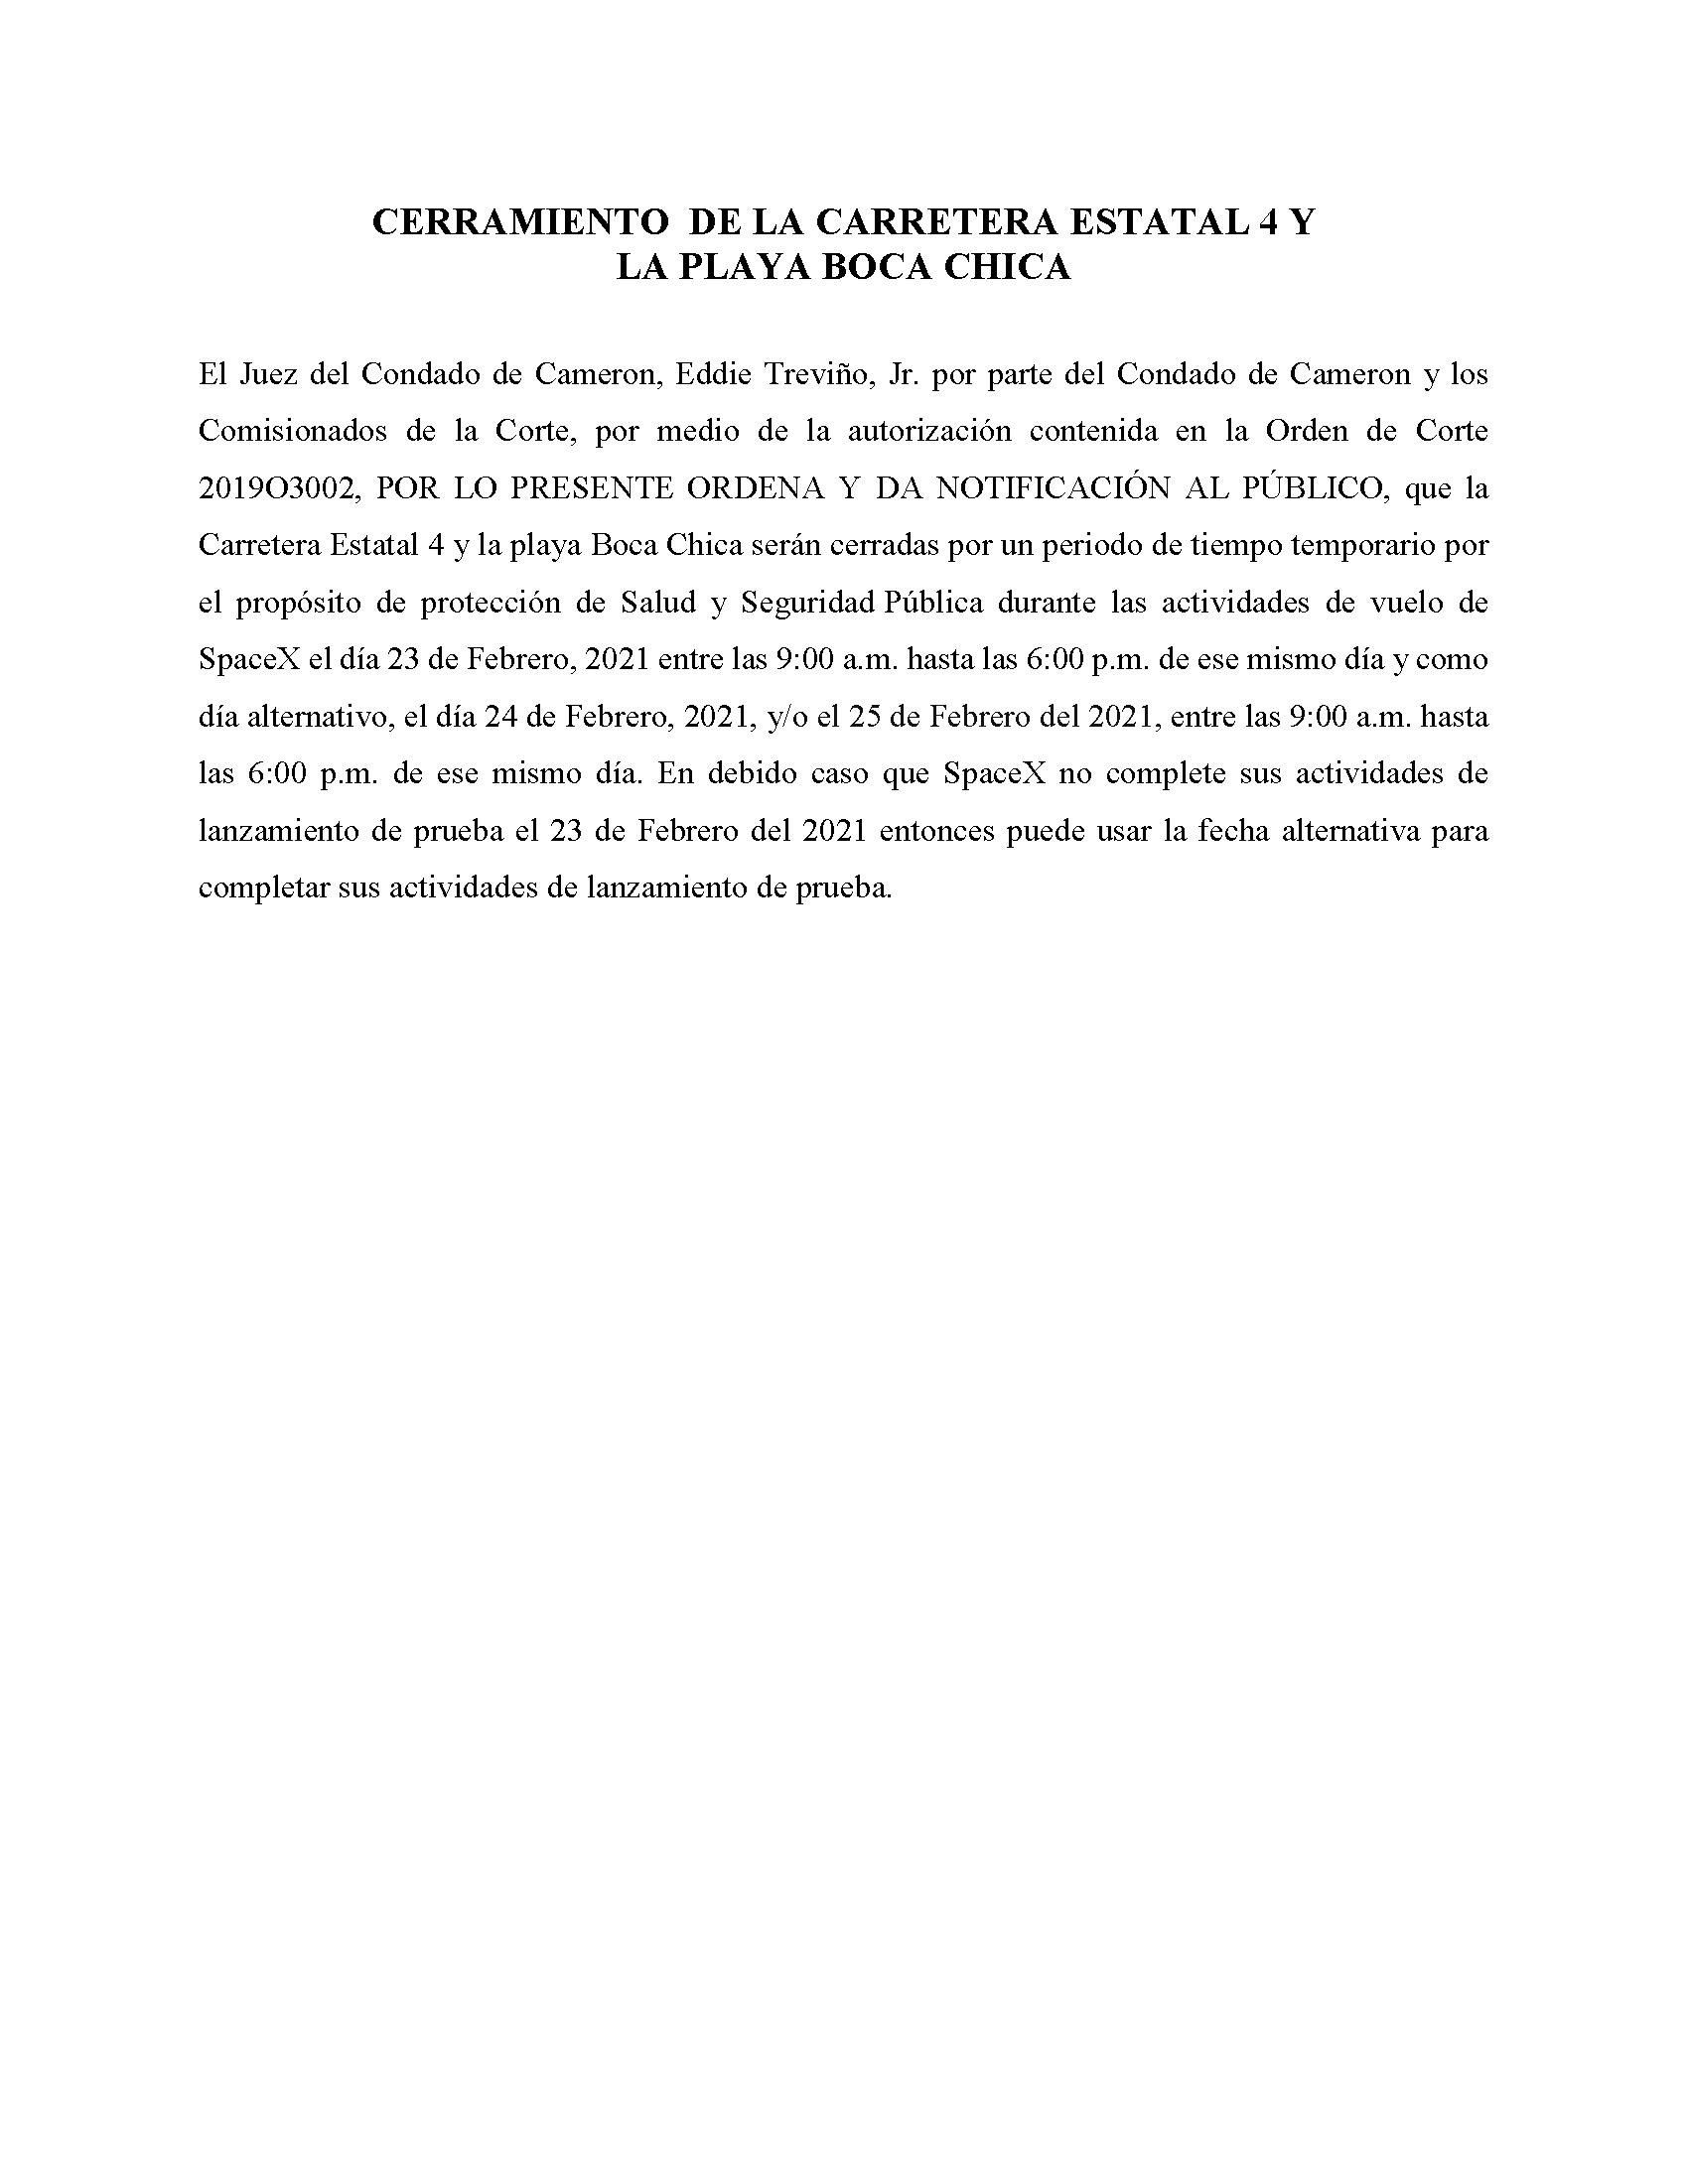 ORDER.CLOSURE OF HIGHWAY 4 Y LA PLAYA BOCA CHICA.SPANISH.02.23.2021